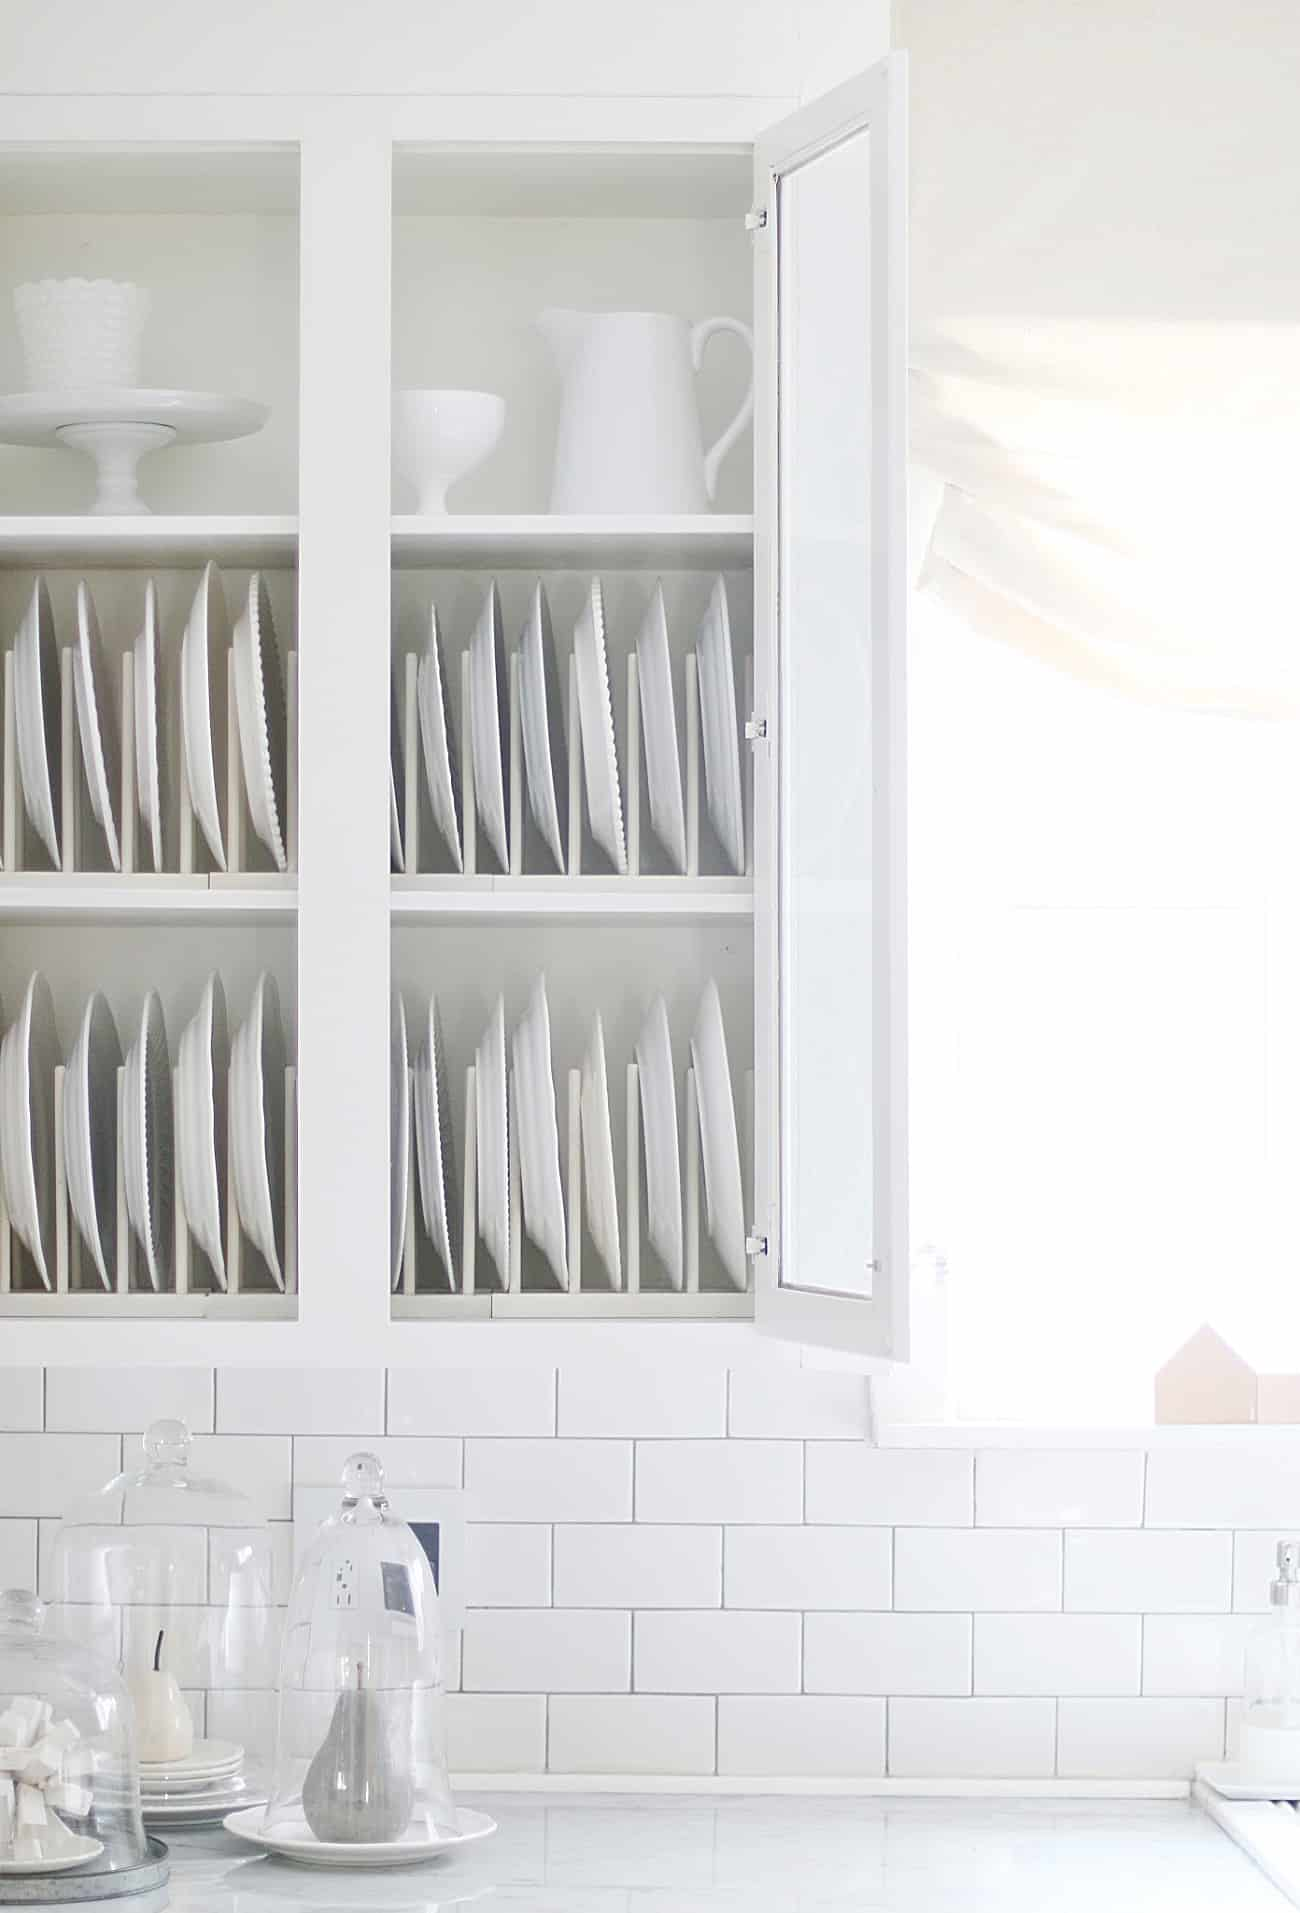 plates on shelf